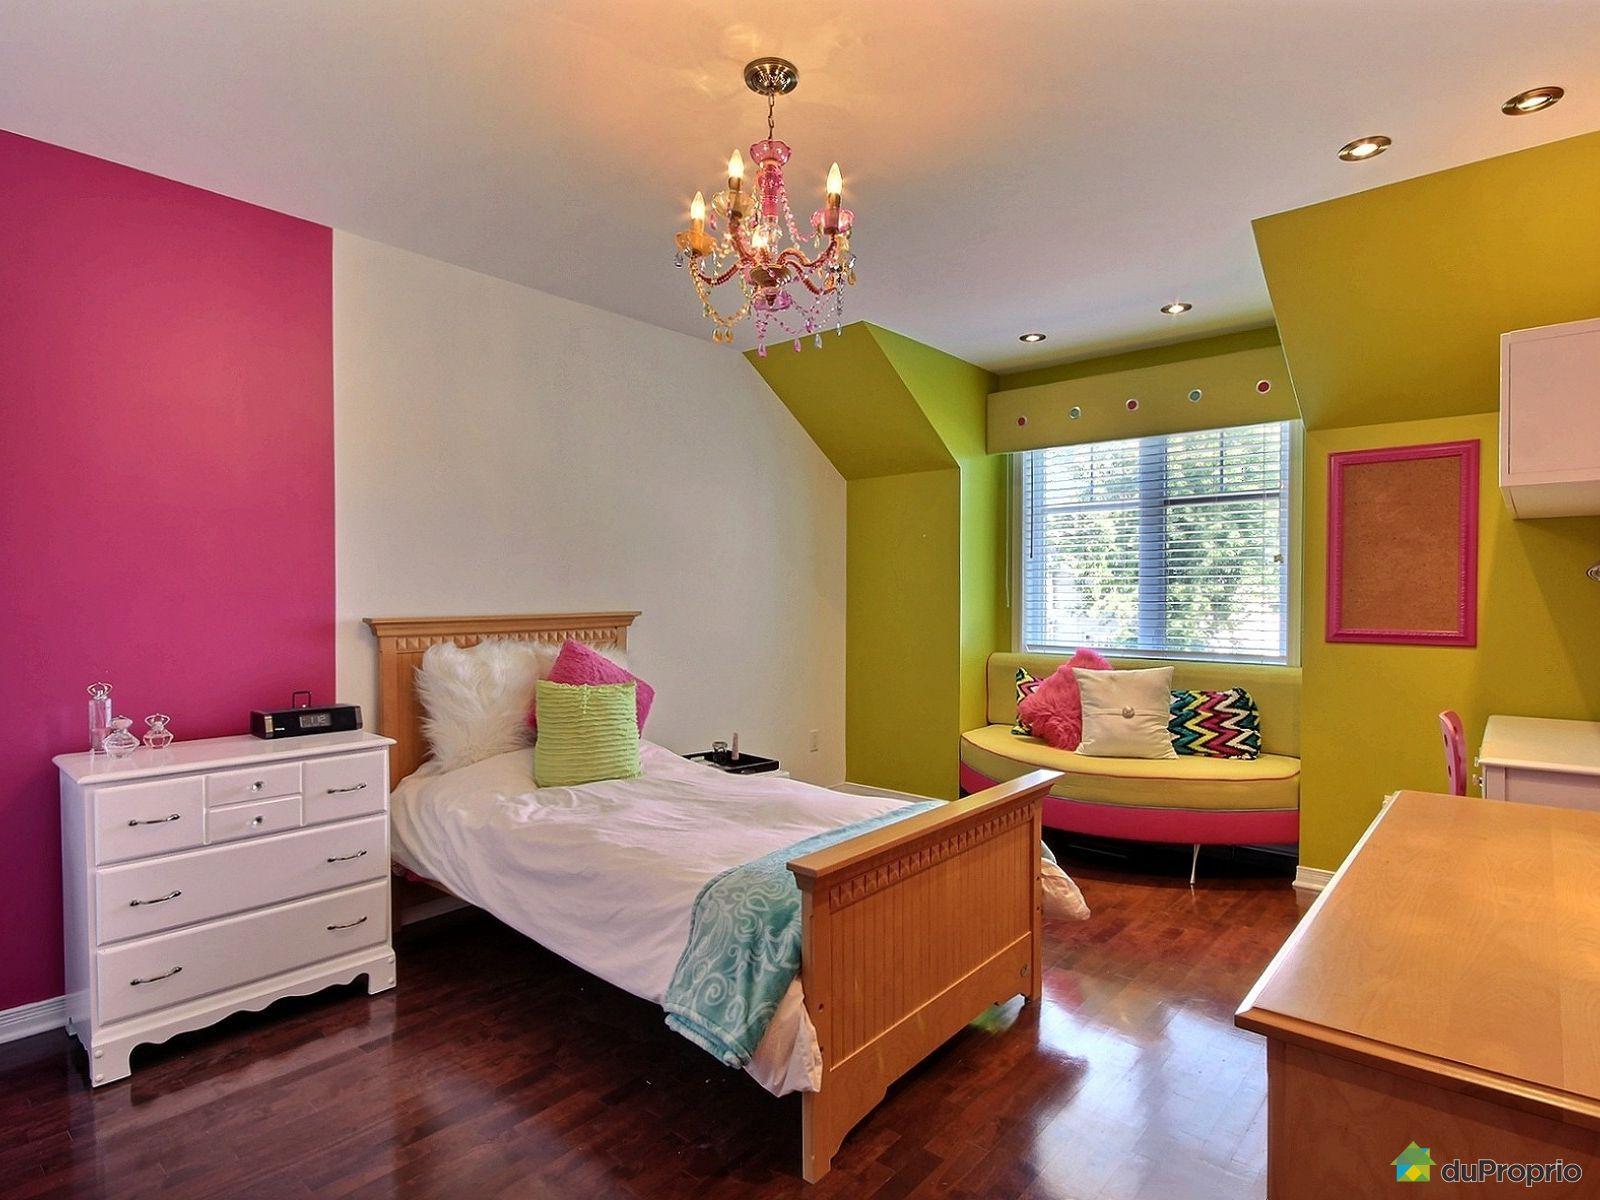 maison vendre repentigny 252 rue mond immobilier qu bec duproprio 716865. Black Bedroom Furniture Sets. Home Design Ideas